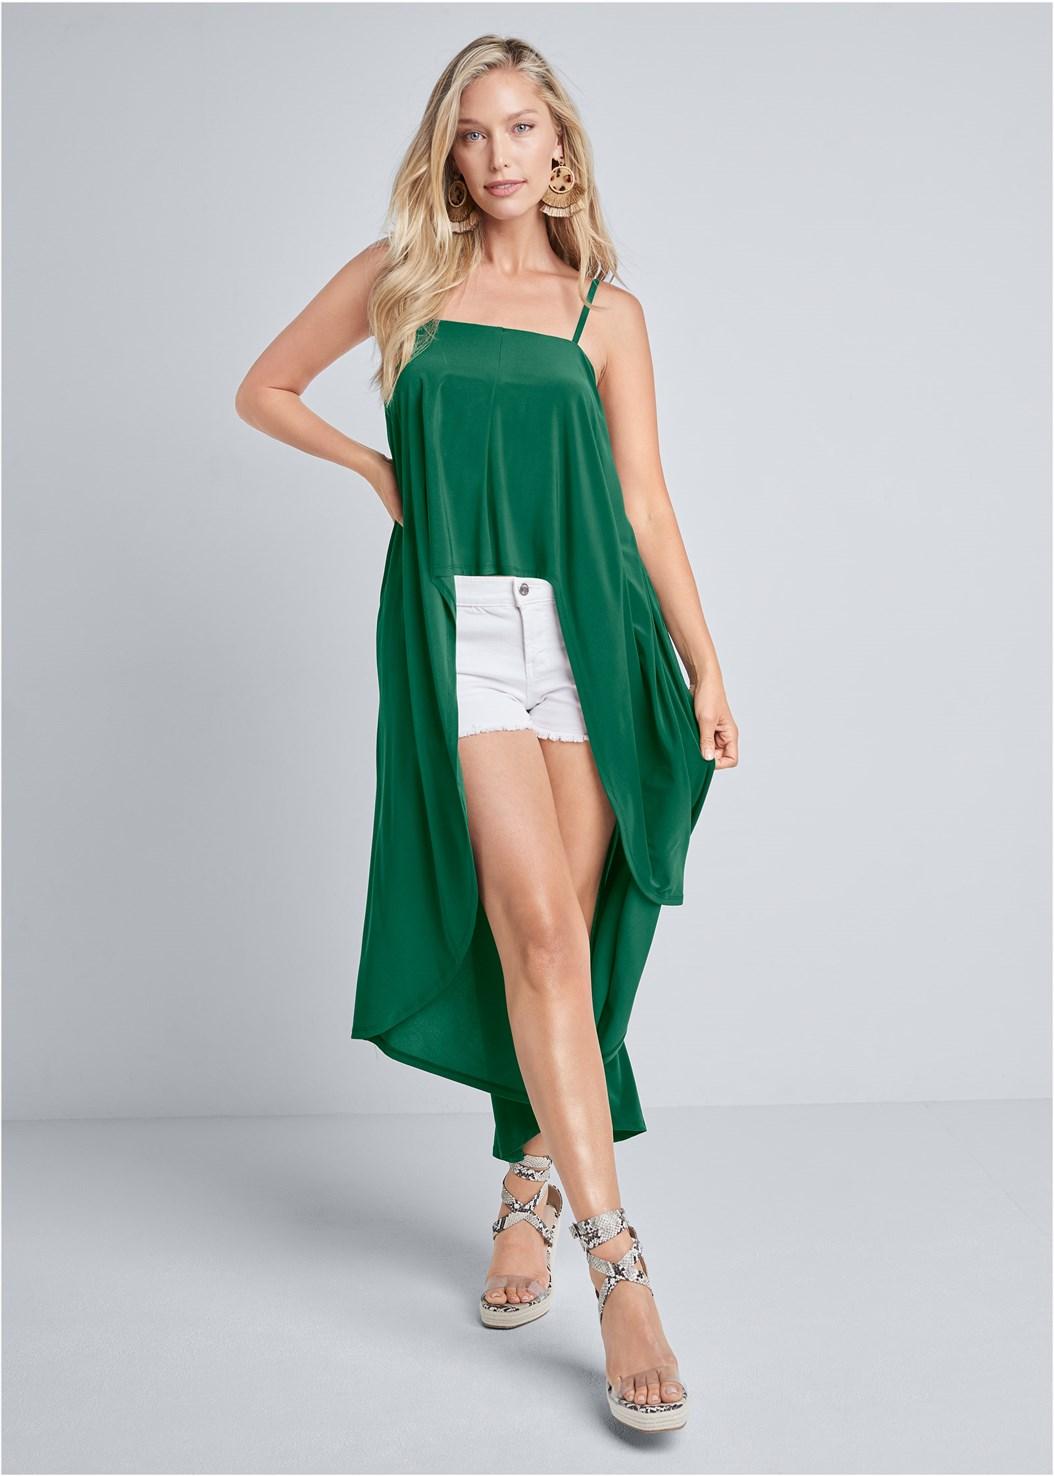 Sleeveless Maxi Top,Cut Off Jean Shorts